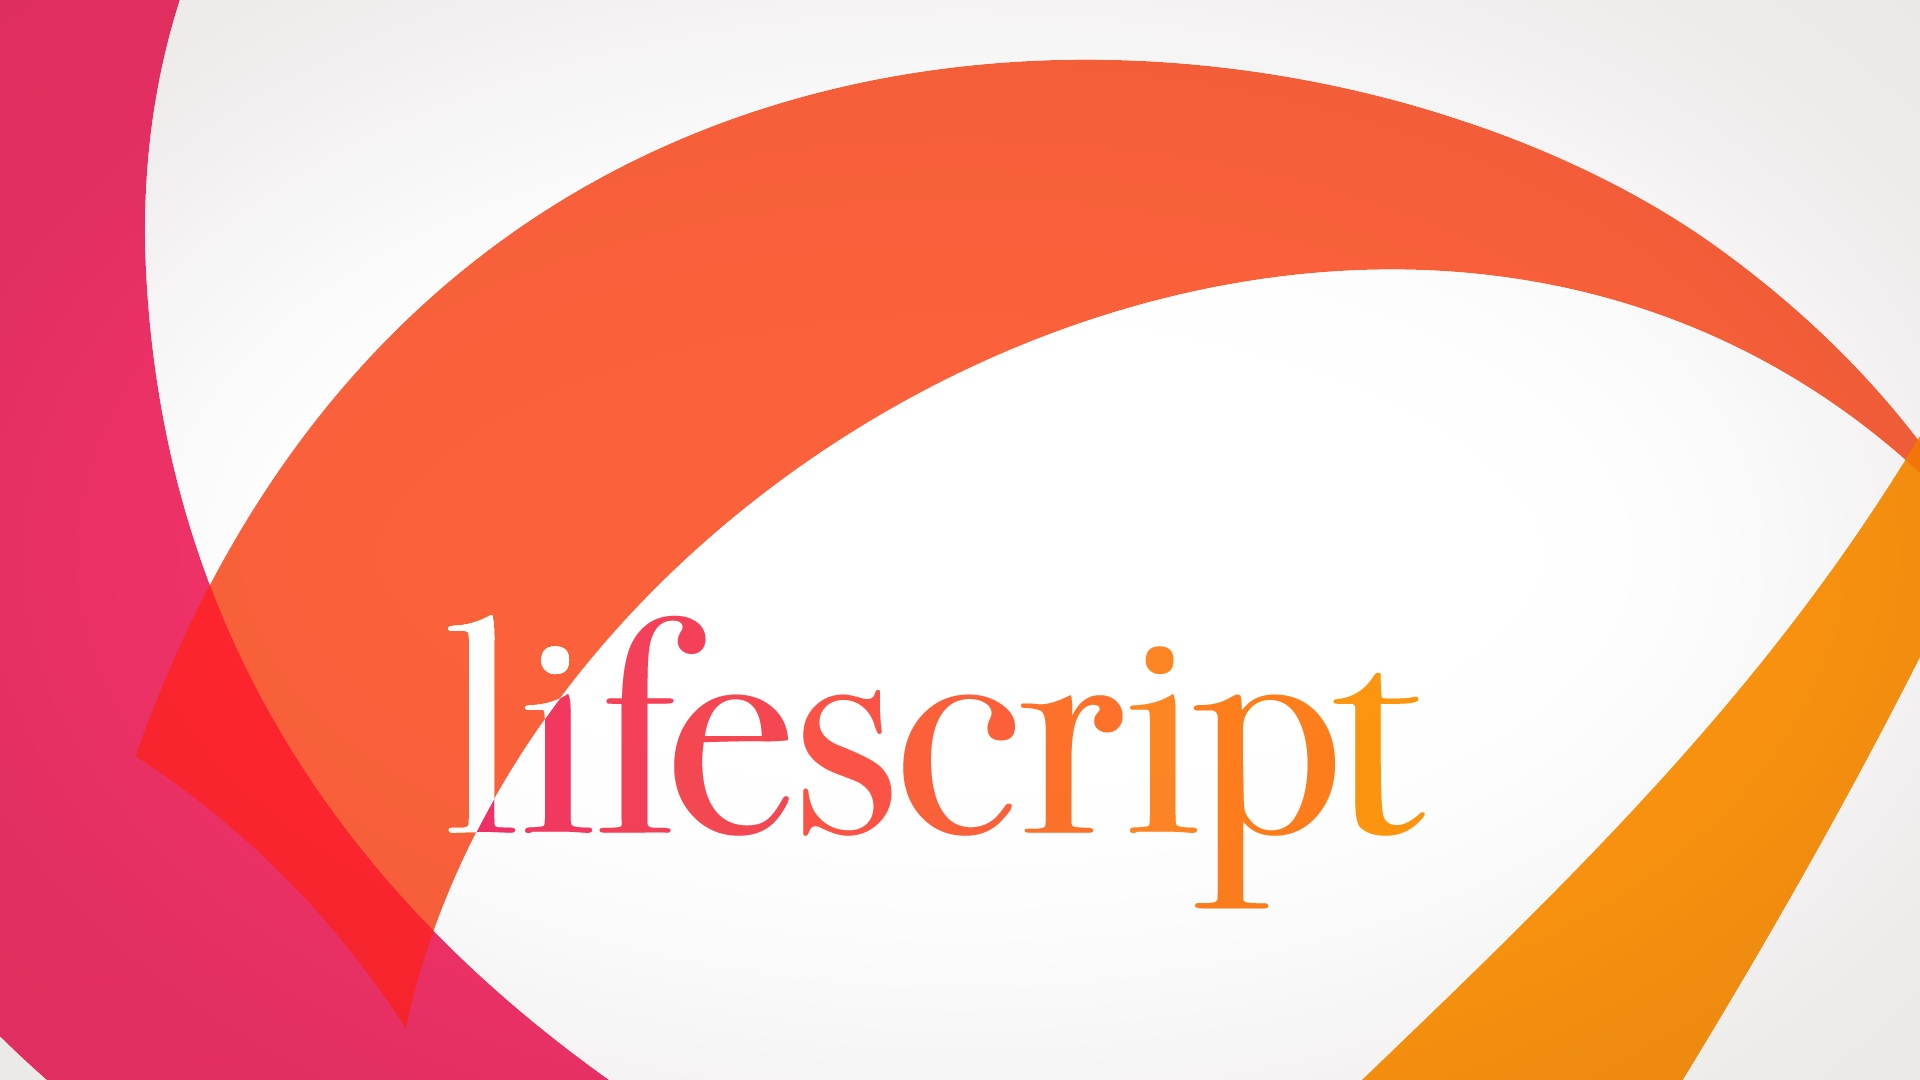 network logo ID | Lifescript-tv | motion graphic design company: jonberrydesign